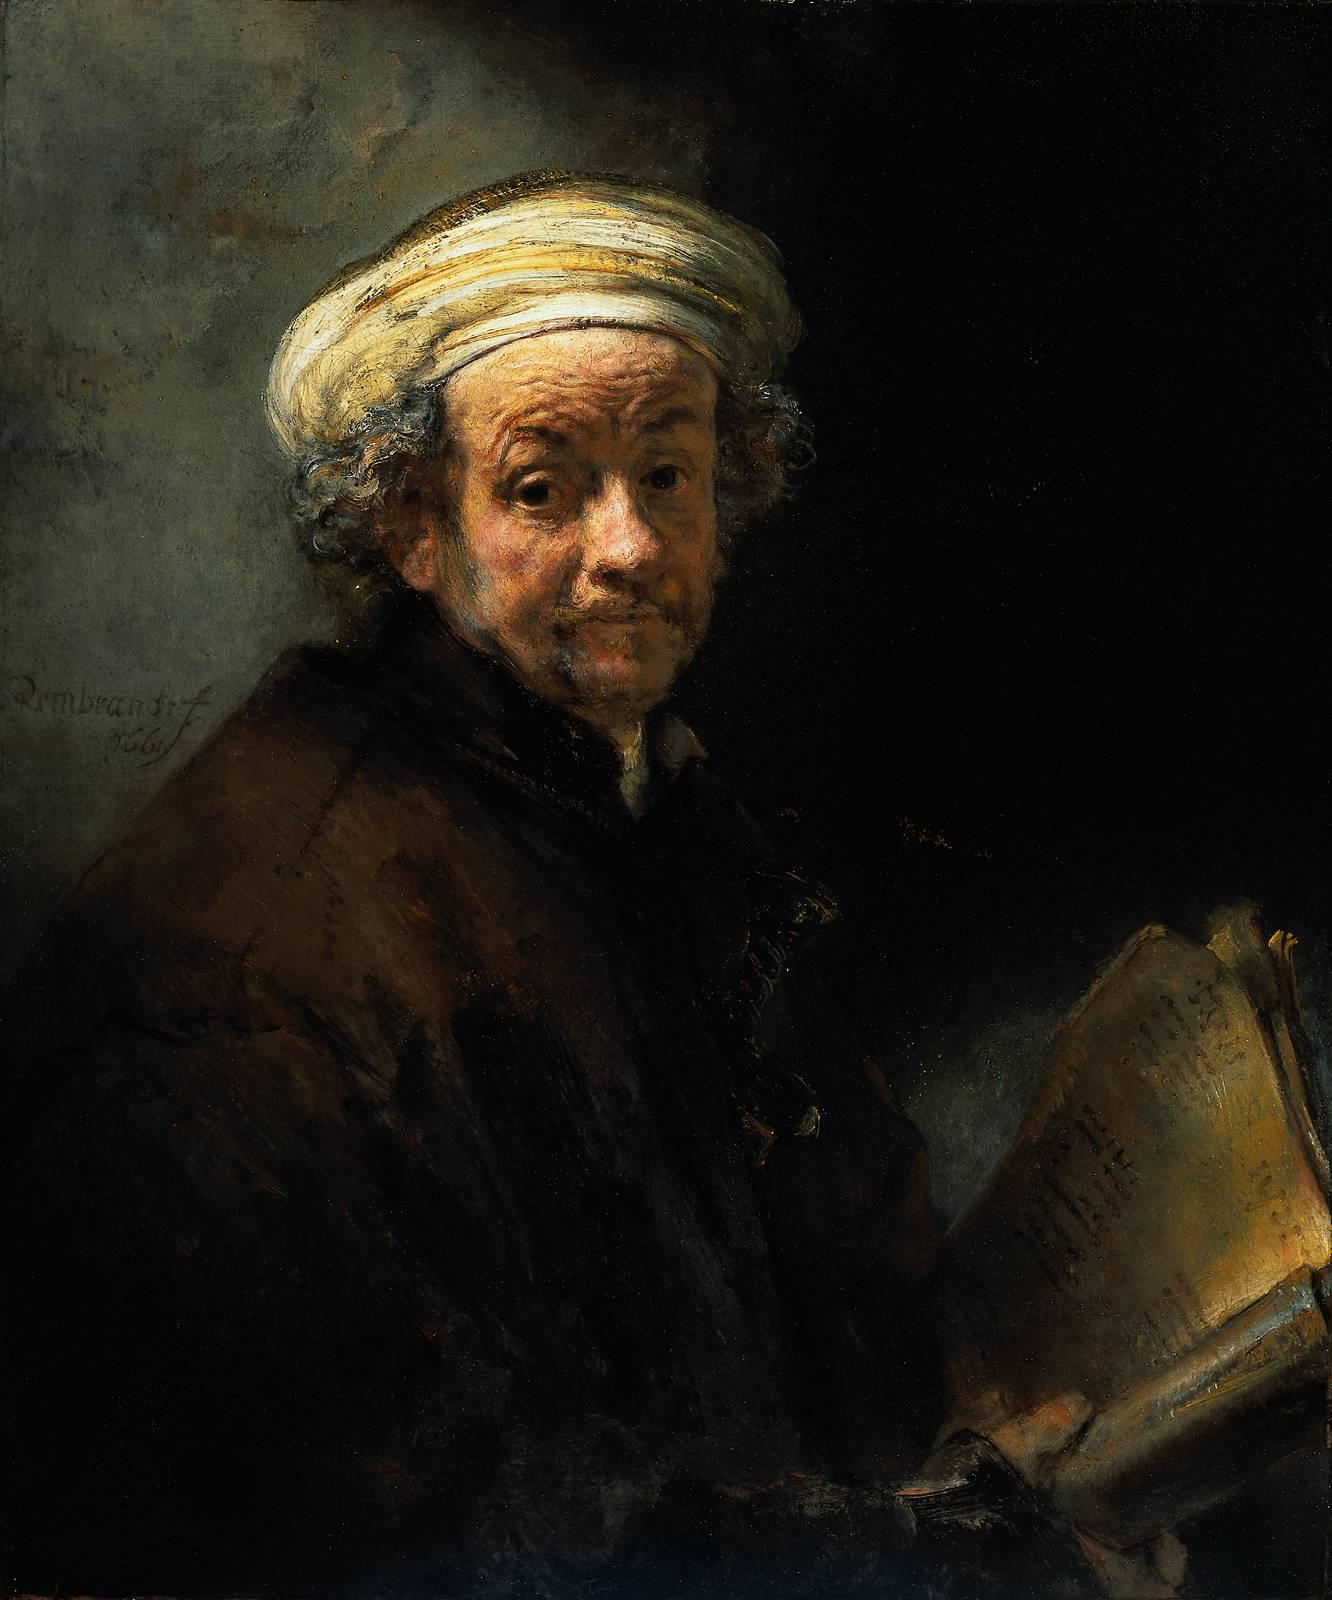 Rembrandt En De Engelen-01-Acrostichon-01